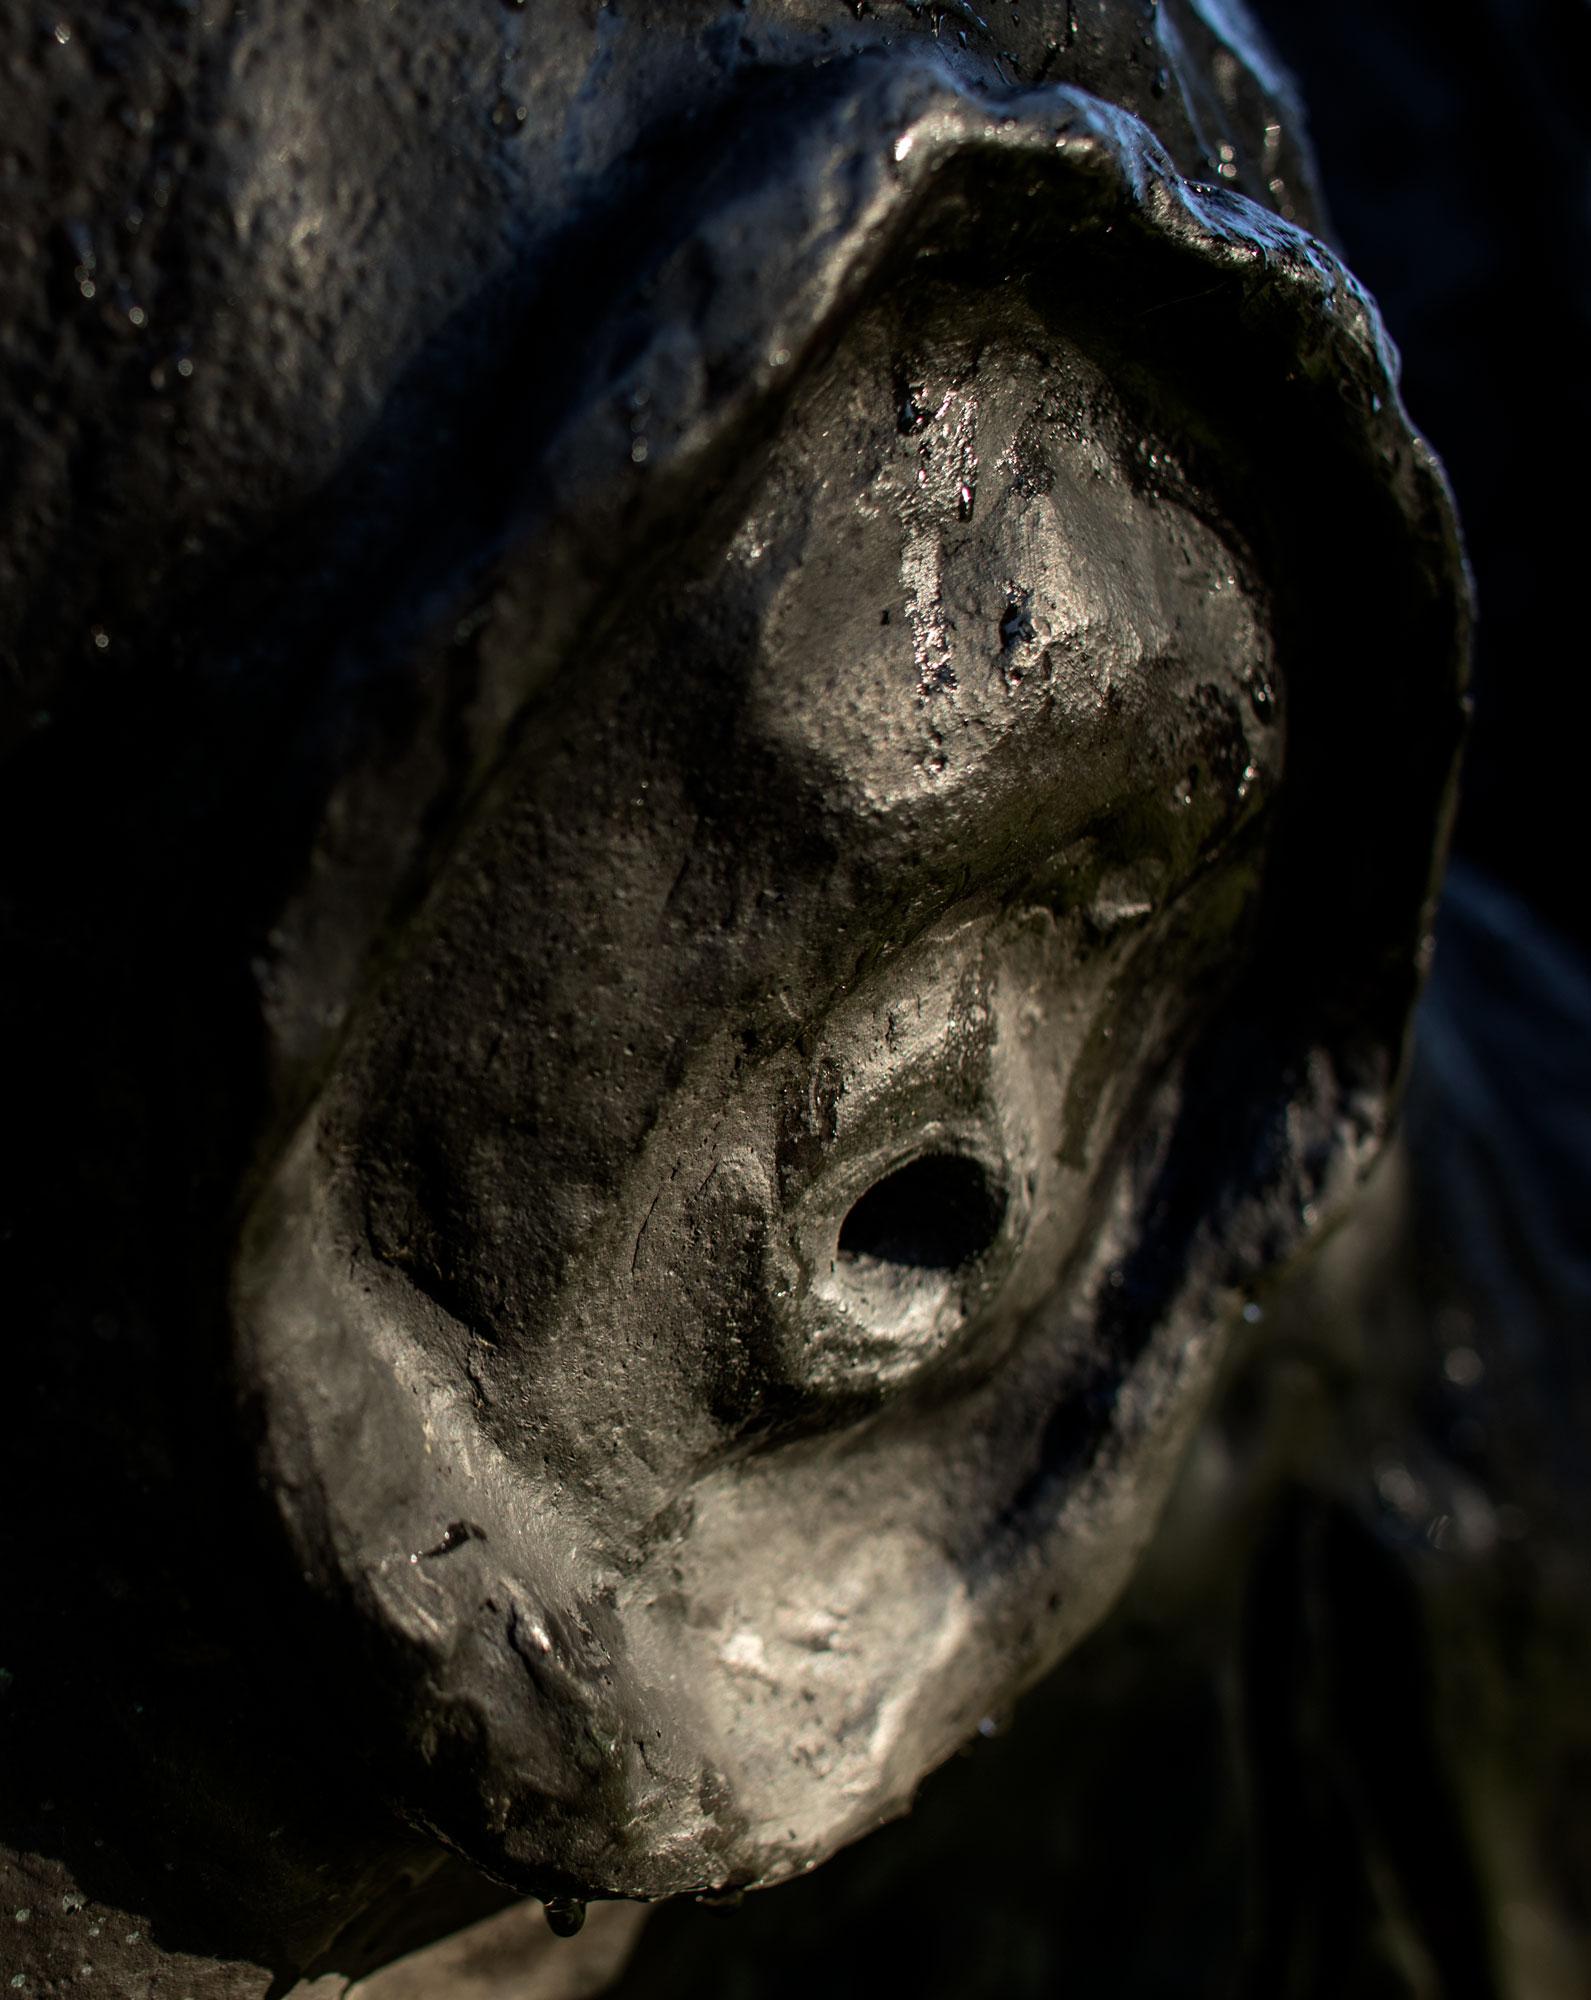 Sculpture by Tal R